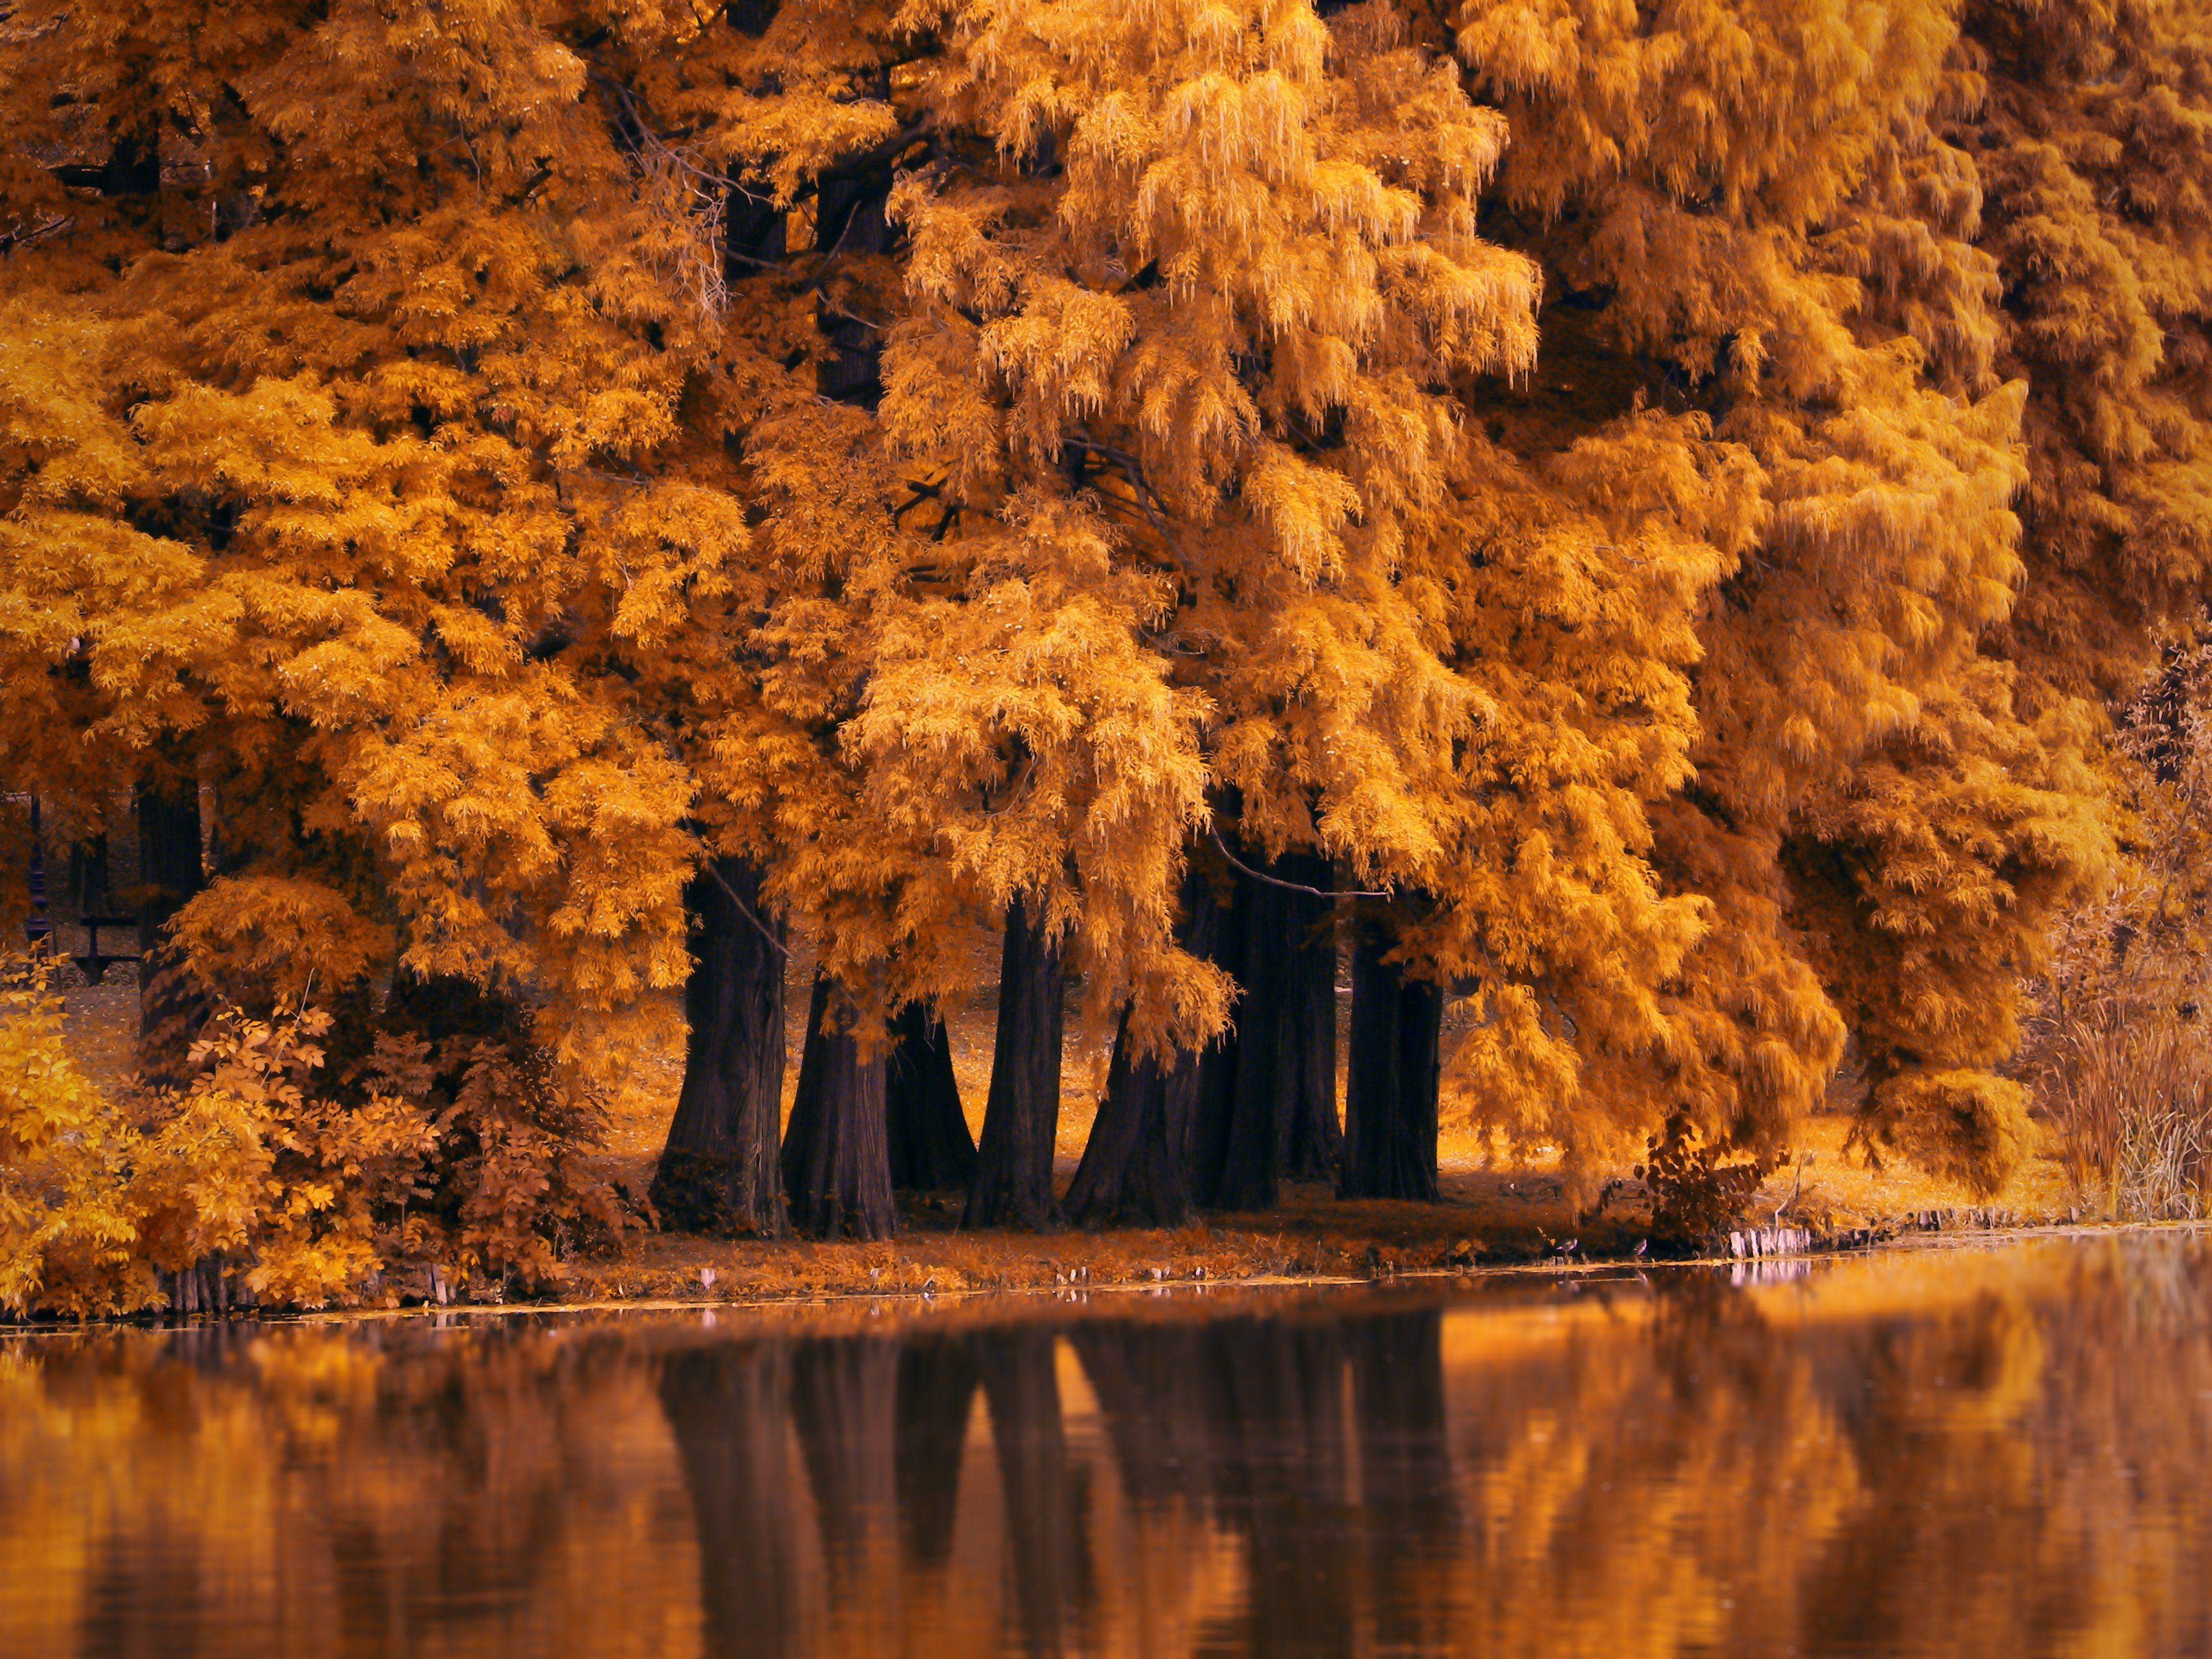 Autumn 4k Wallpapers Top Free Autumn 4k Backgrounds Wallpaperaccess